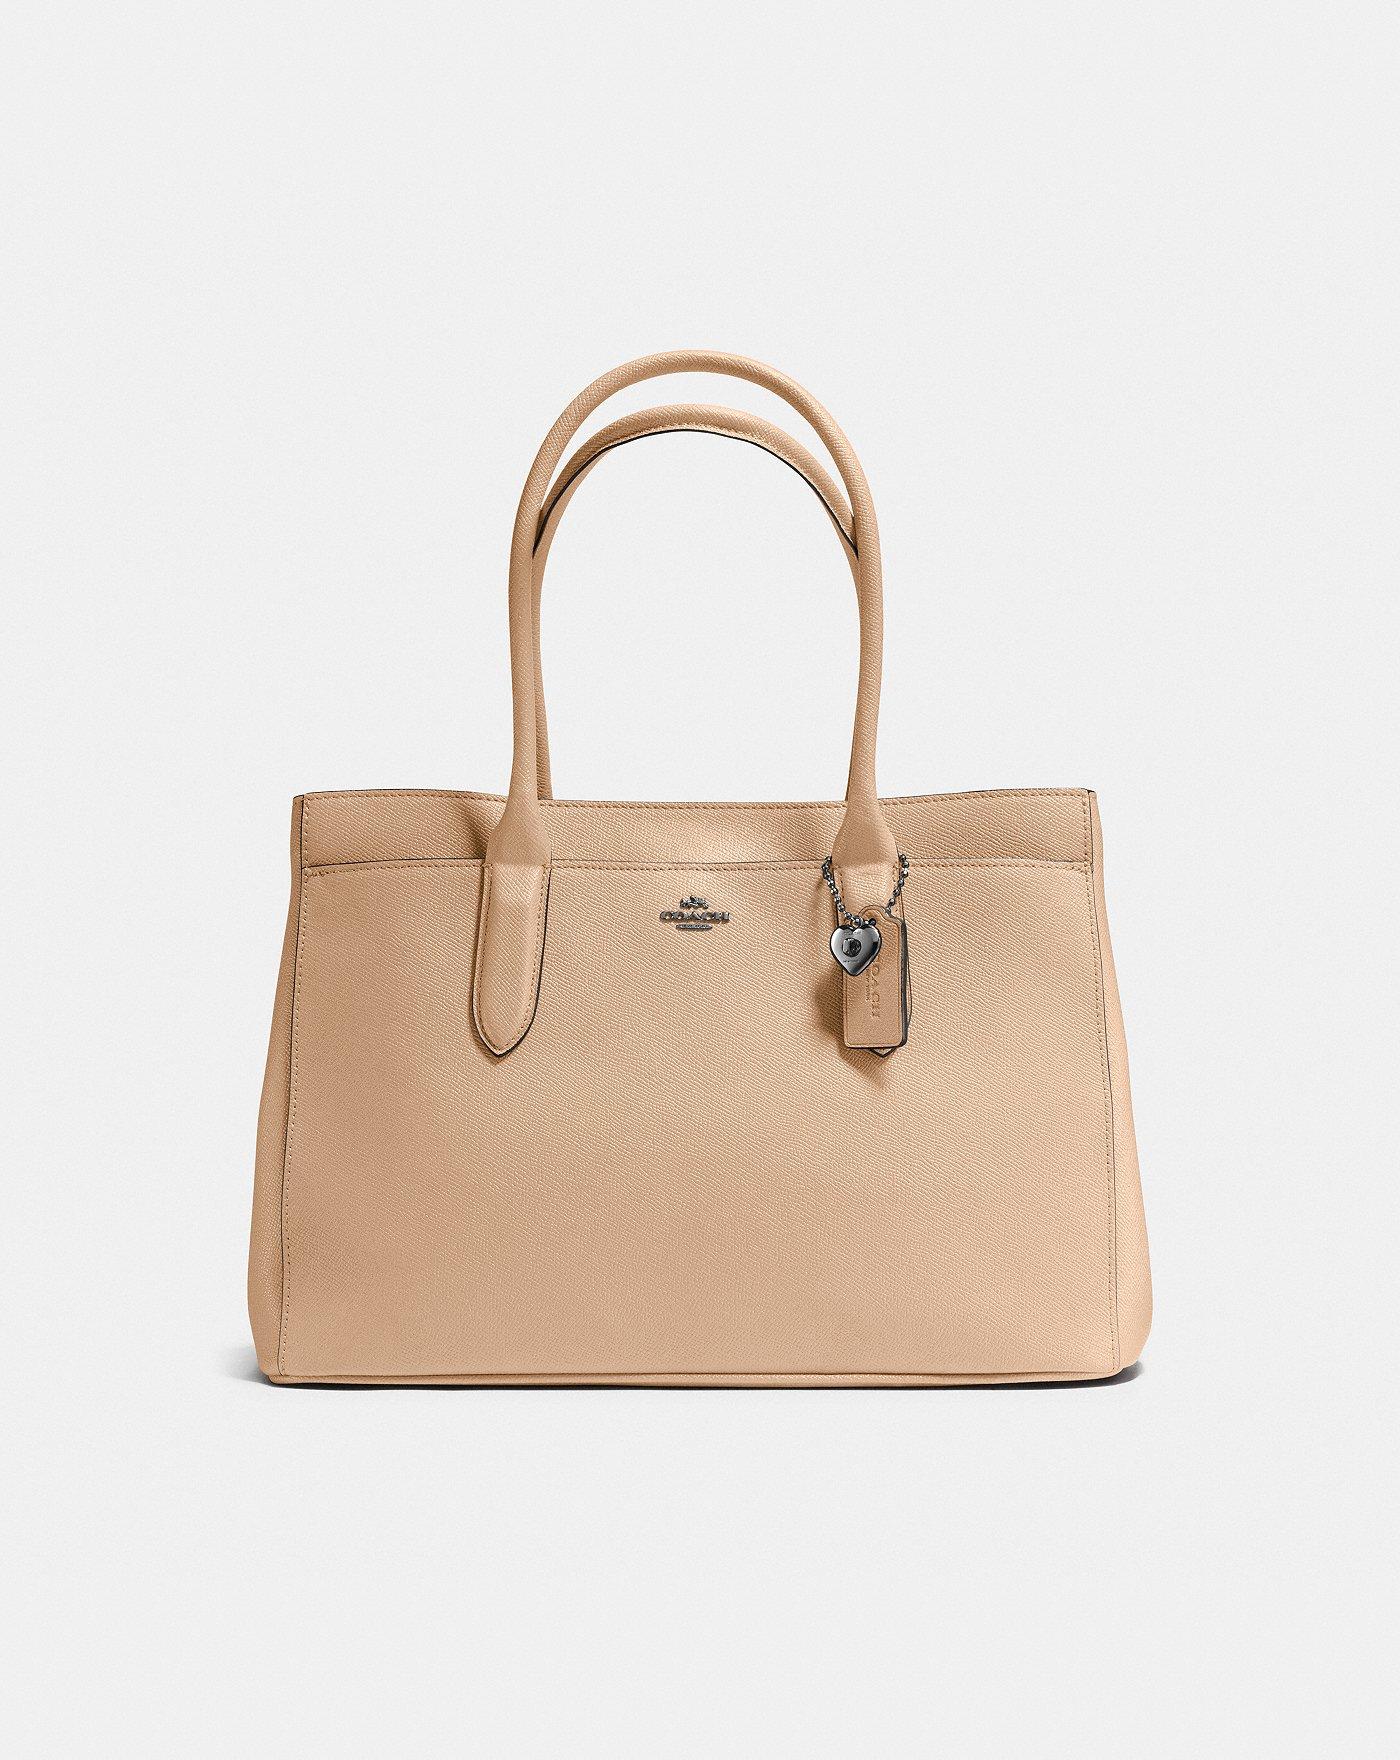 8ce5f4bccd39 Coach Sale 2018  Check Out Our Favorite Commuter Bag